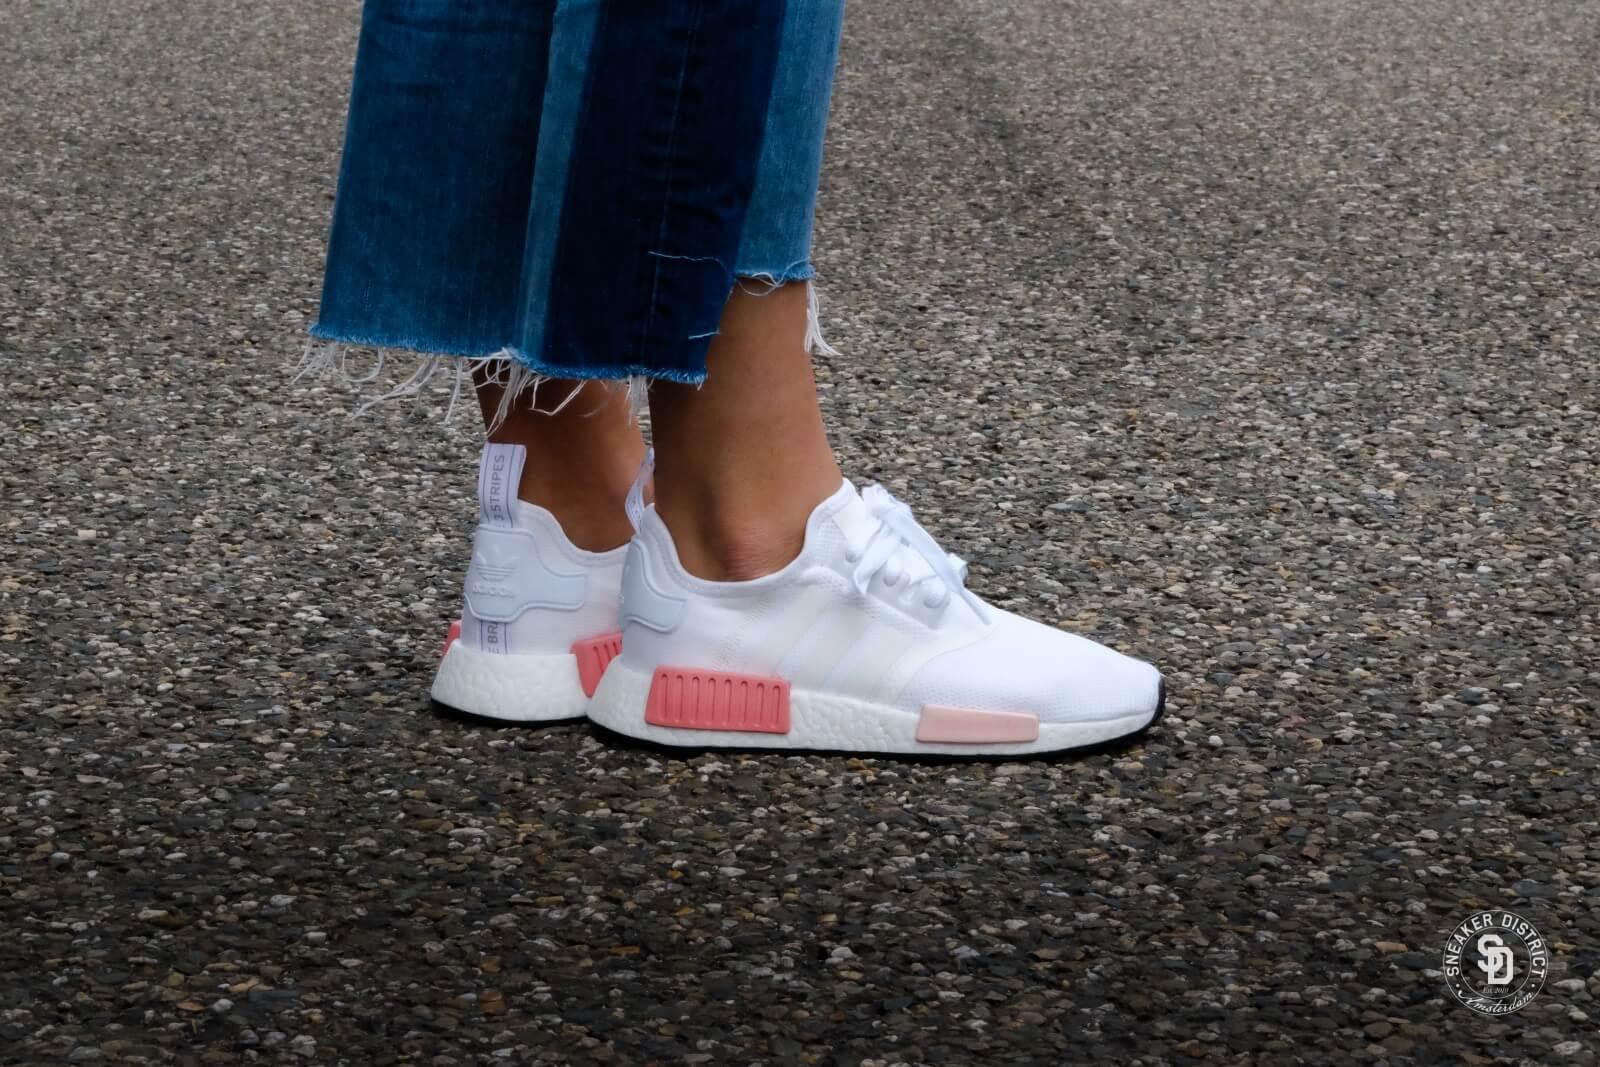 Adidas WMNS NMD R1 Footwear White/Icey